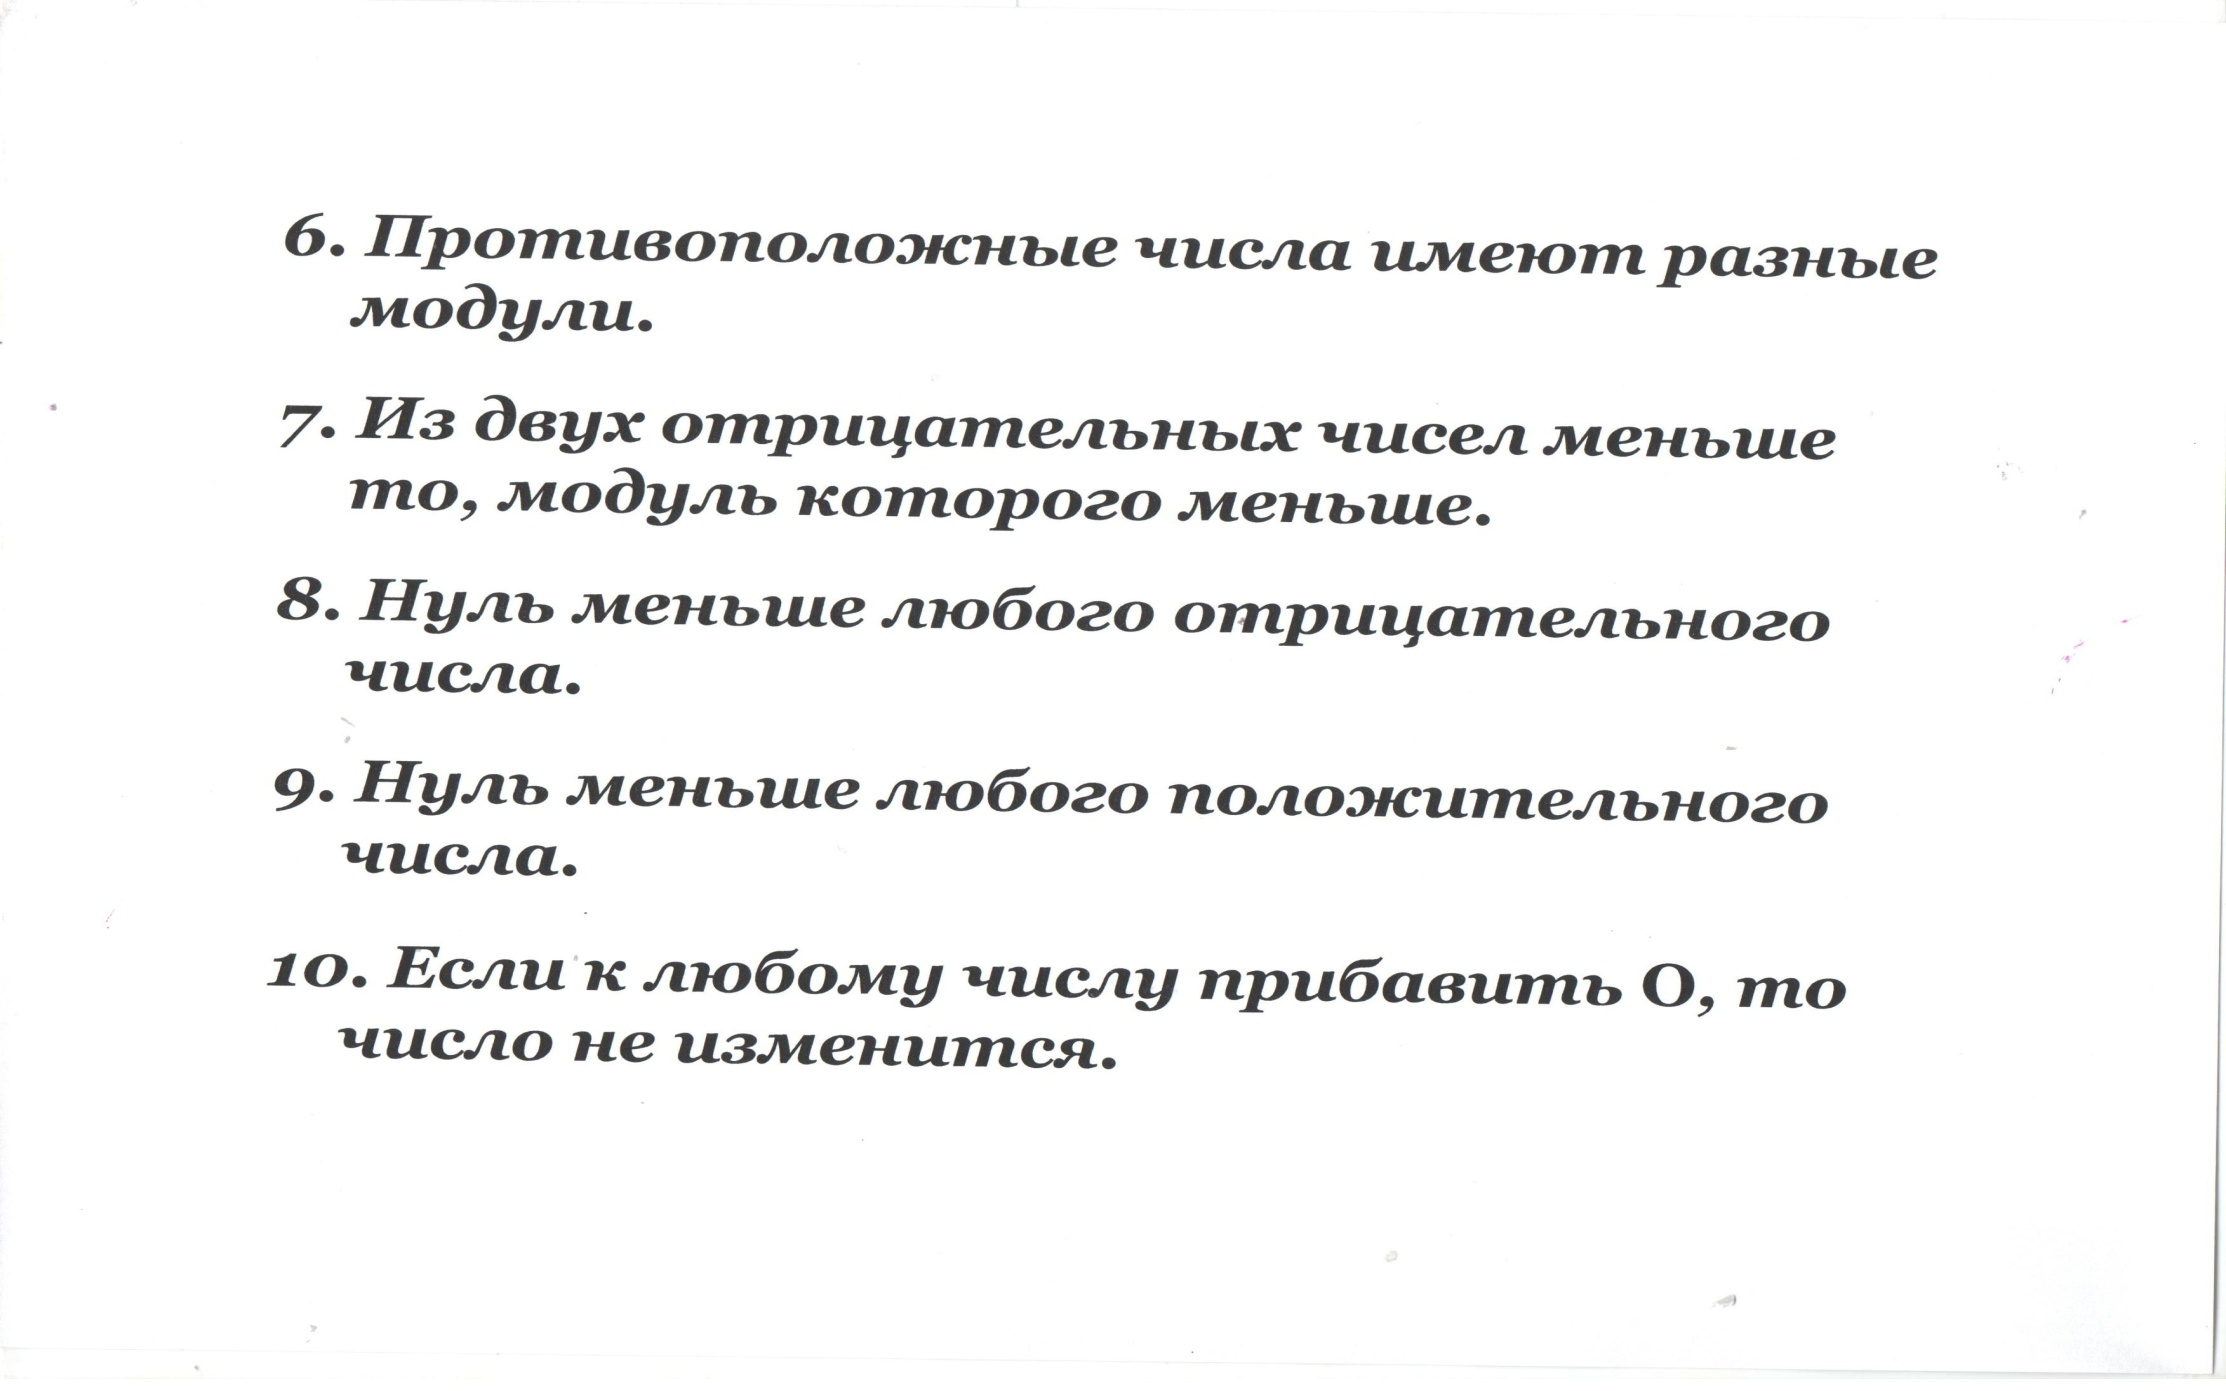 C:\Documents and Settings\Школа\Мои документы\Мои рисунки\Изображение\Изображение 036.jpg